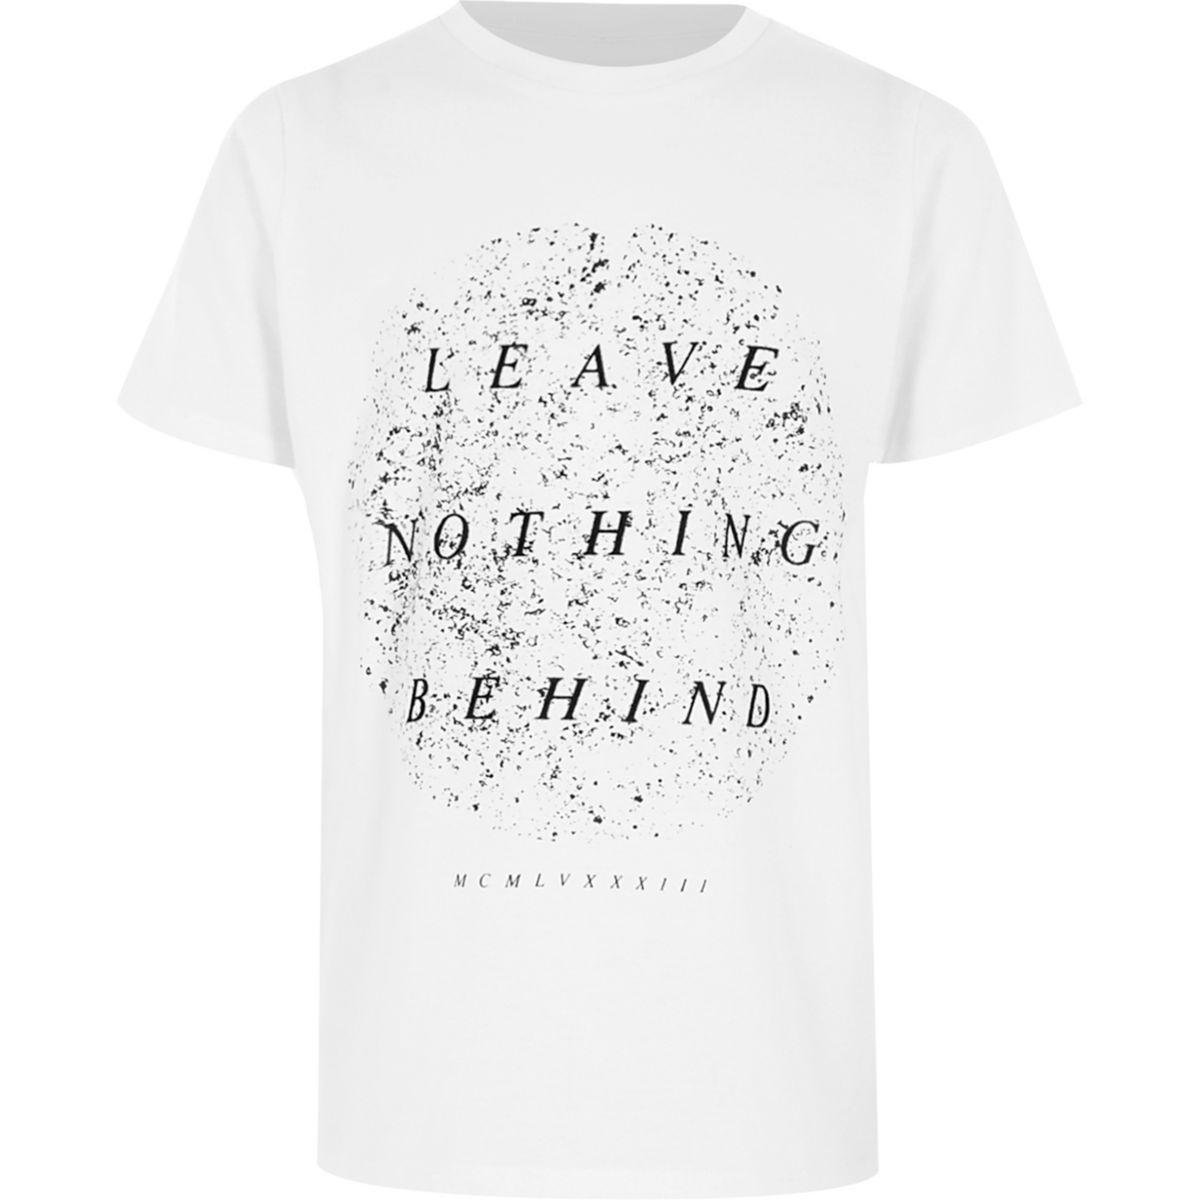 Boys white 'leave nothing' flocked T-shirt